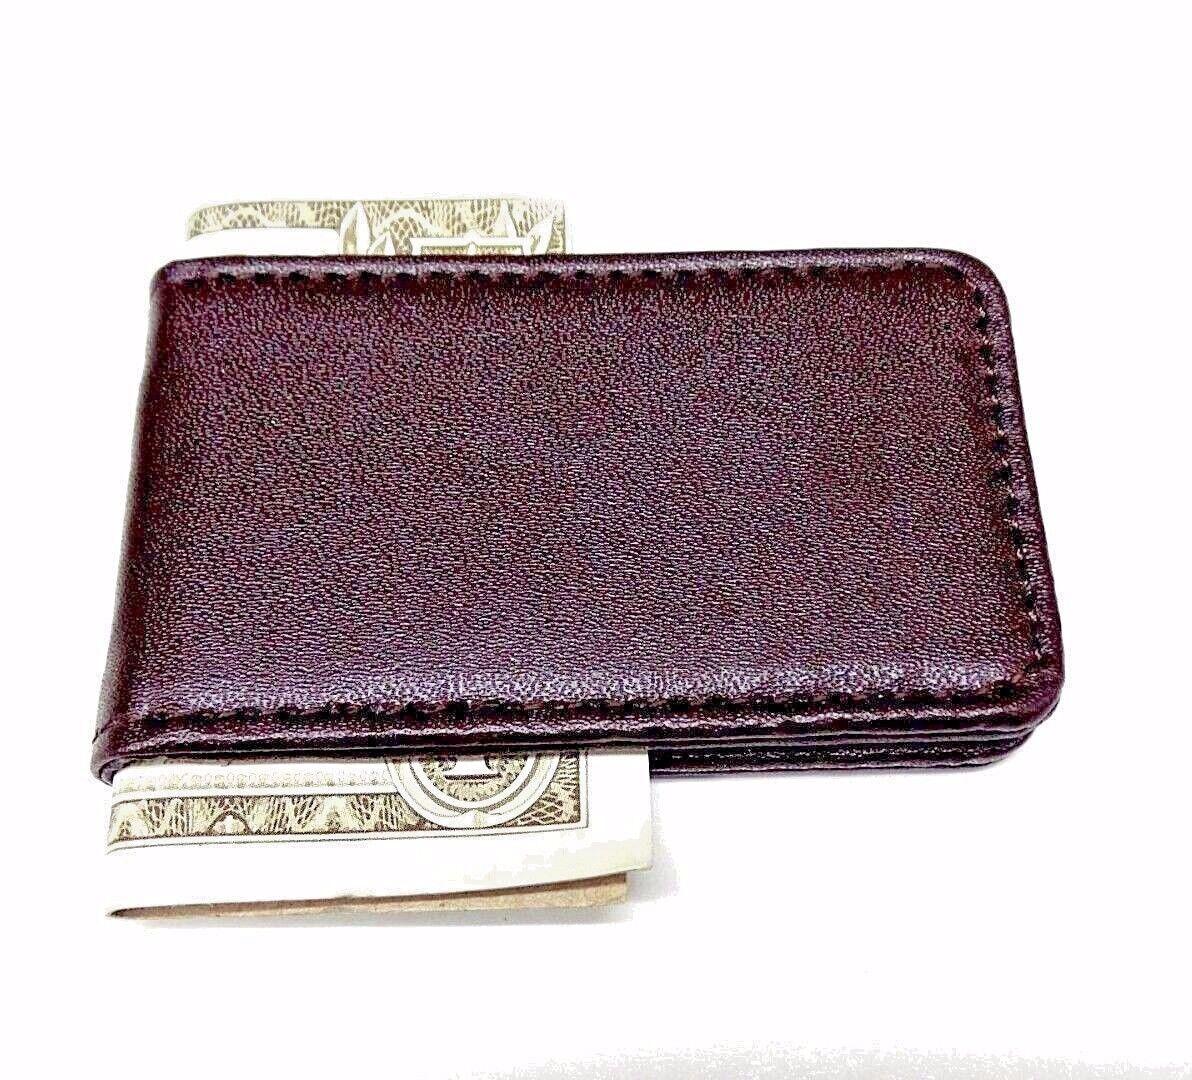 Brown Money Clip Leatherette Magnetic Cash Credit Card Wallet Clipper